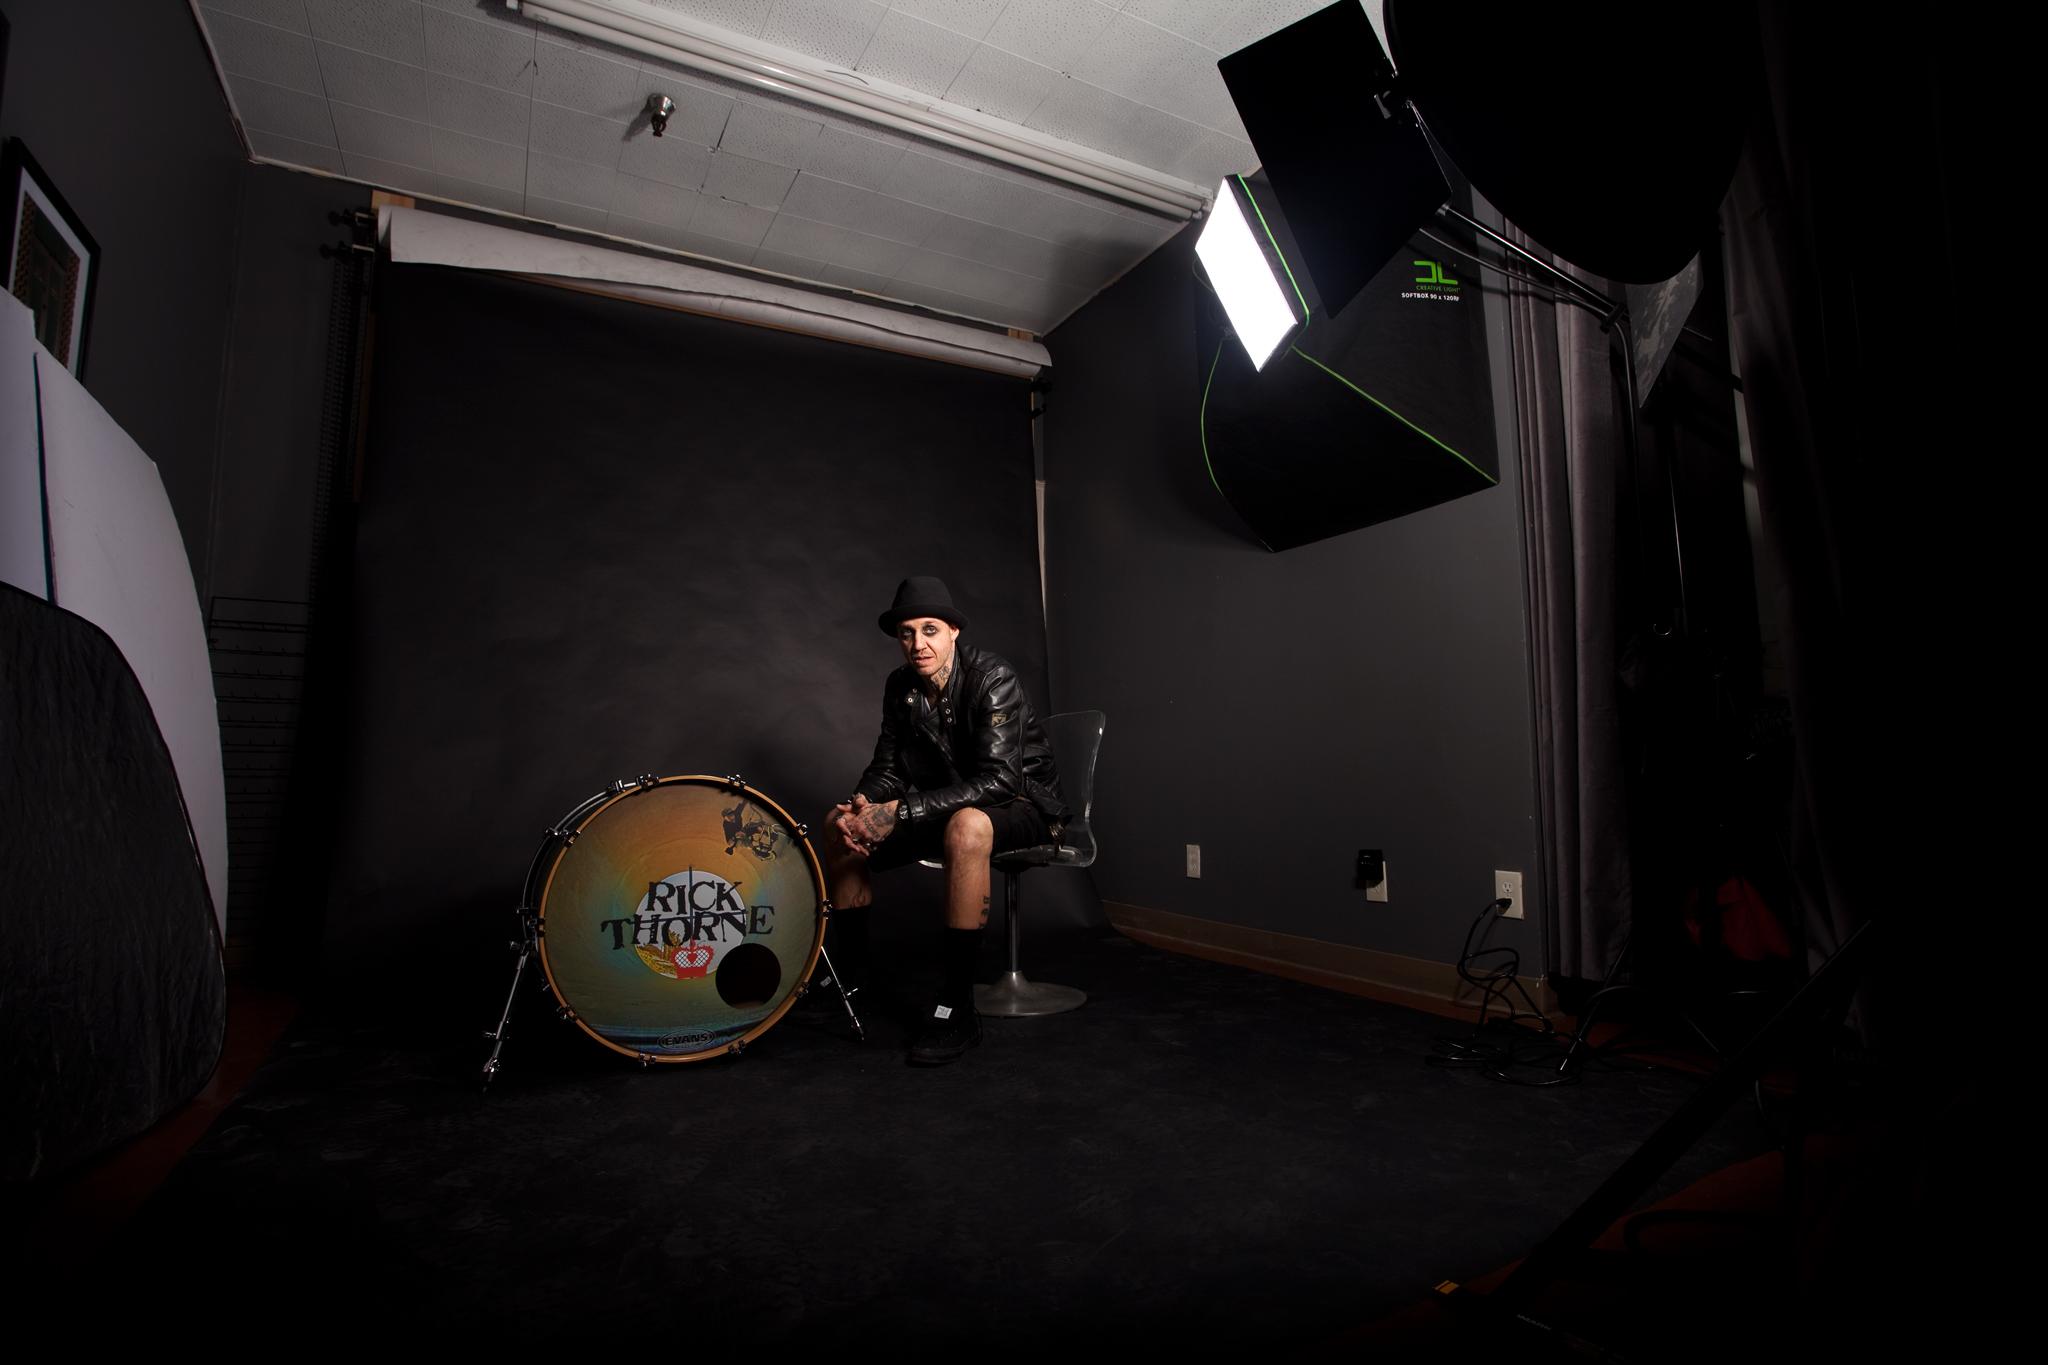 Rick Thorne in my studio behind the scenesmid-shoot